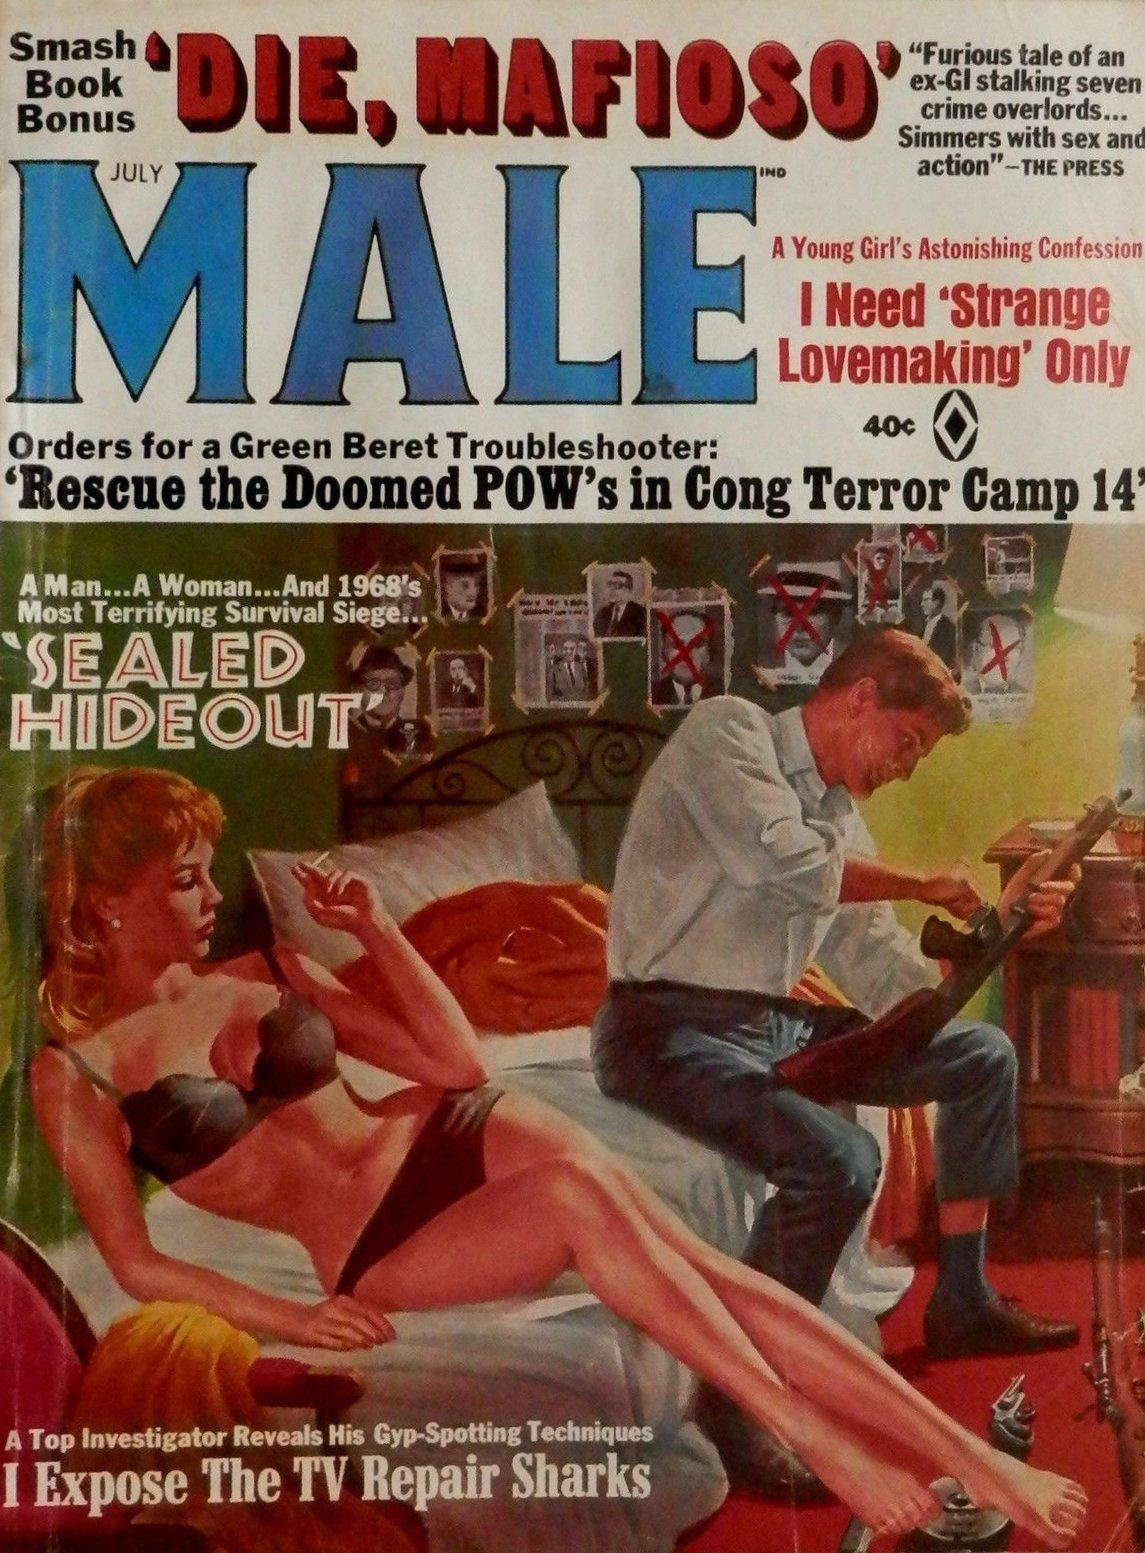 26 Best Cover Illustrators Behind Some Of The Most Iconic Vintage Crime And Thriller books Mort Kunstler